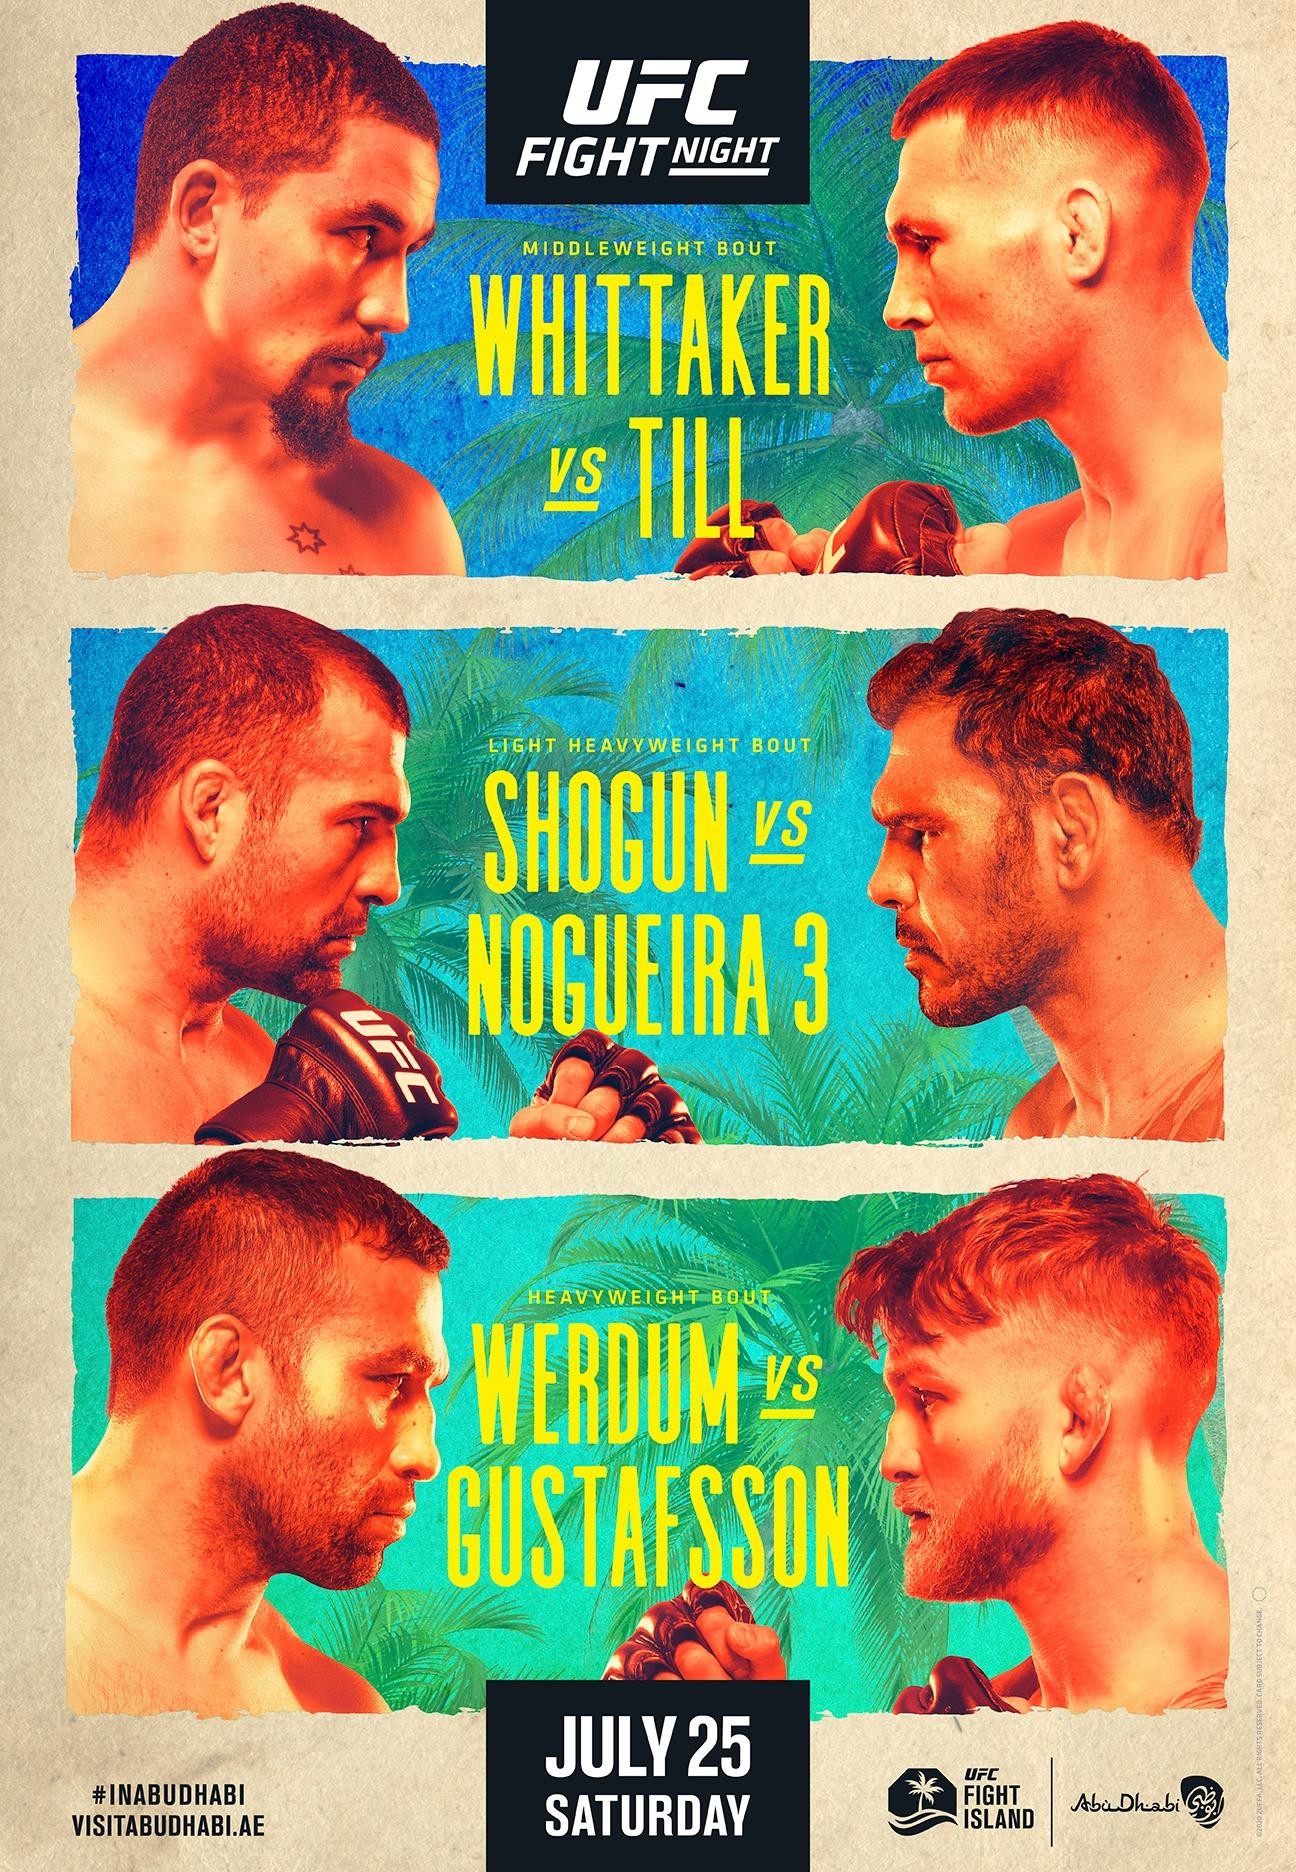 Till vs Whittaker